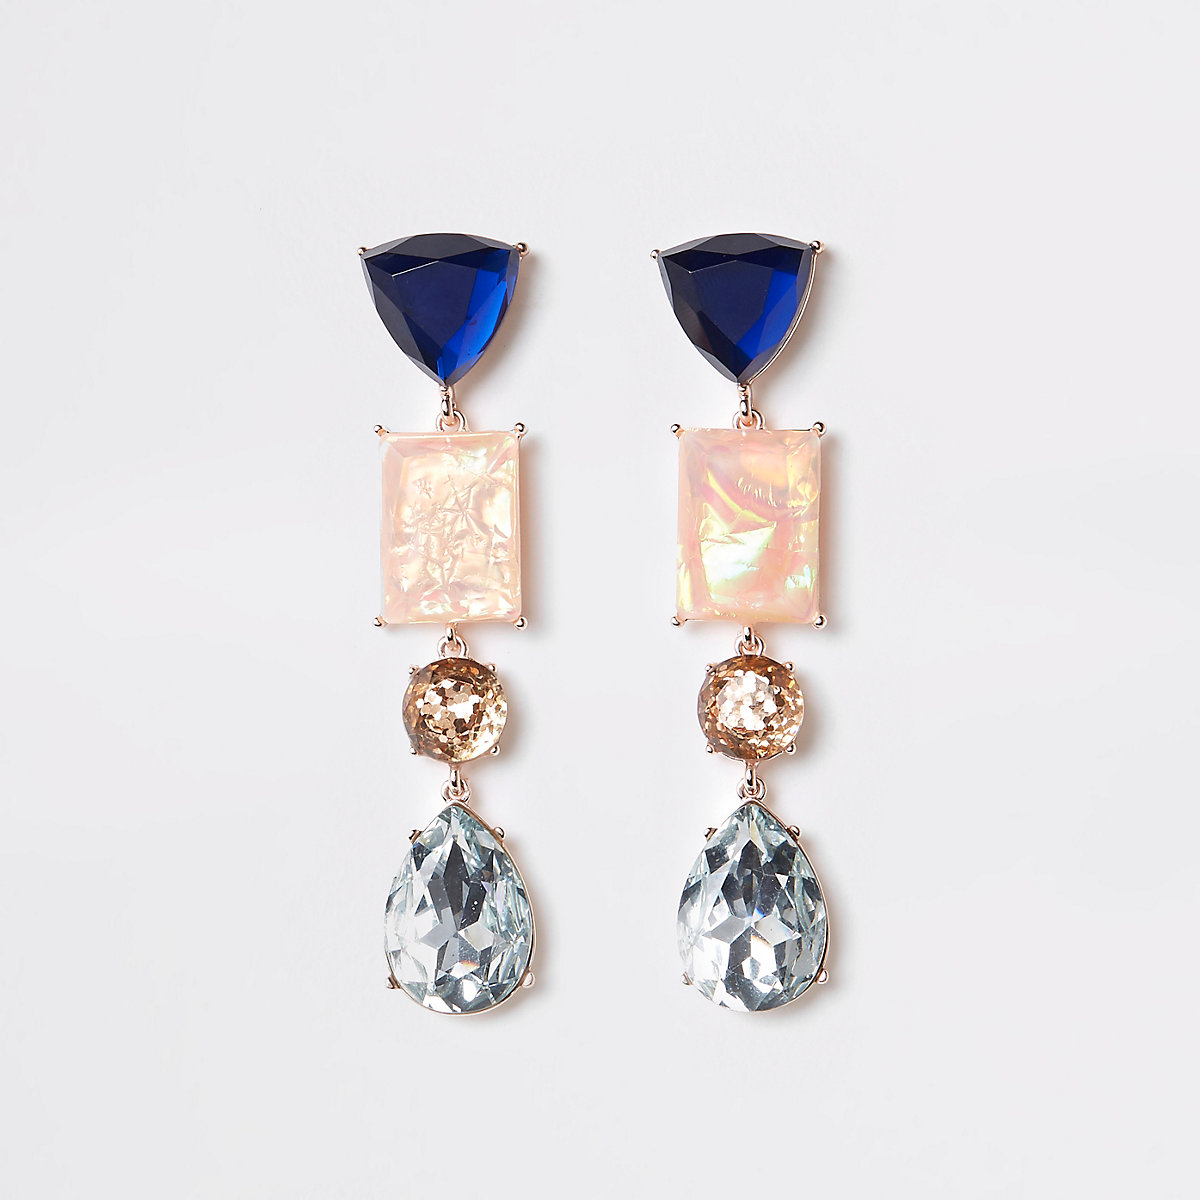 Rose gold color blue jewel drop earrings